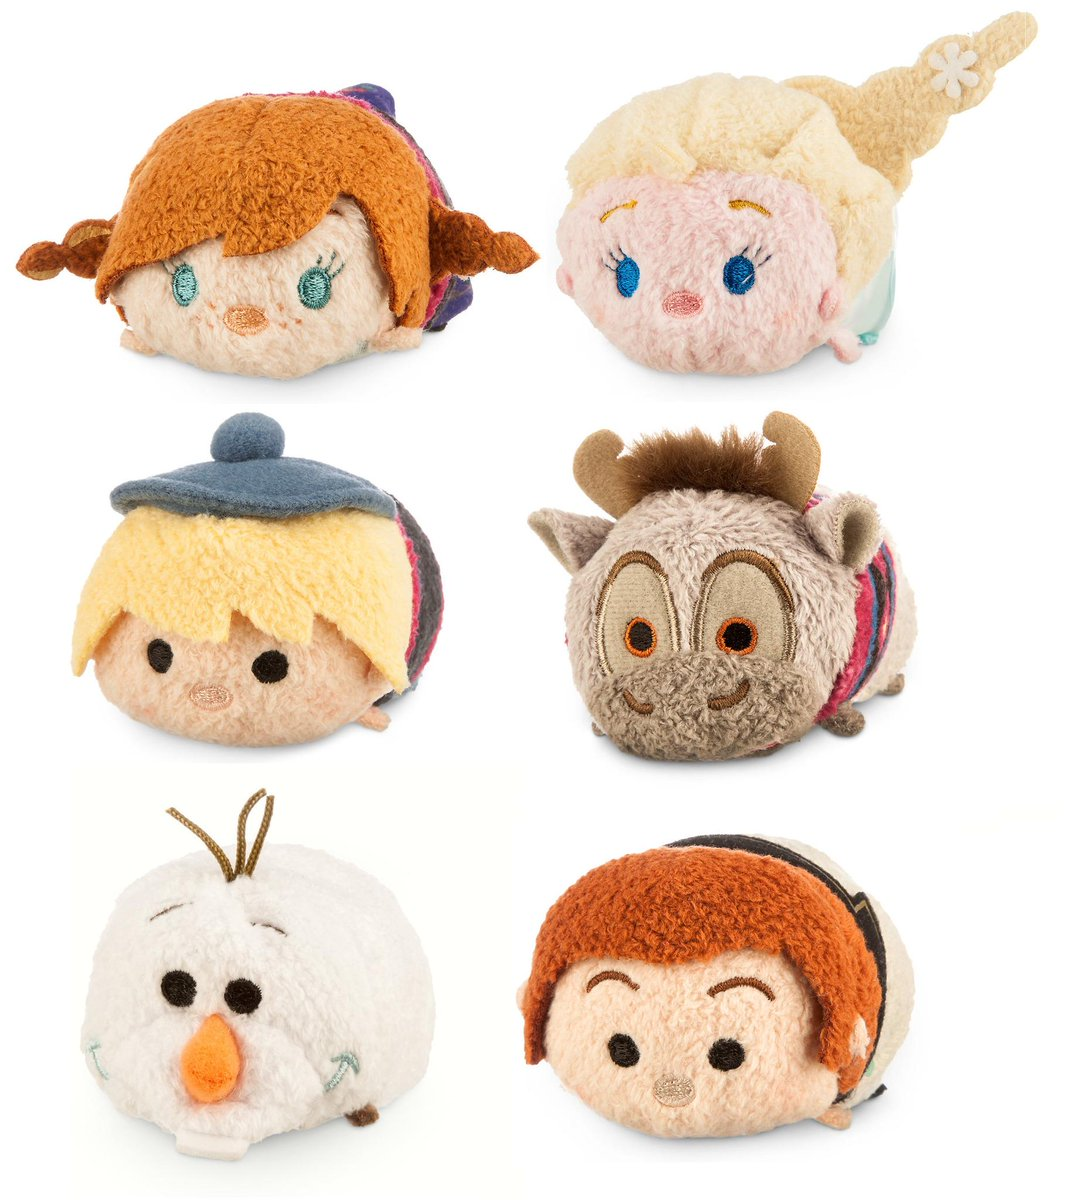 EXCLUSIVE! #Frozen Tsum Tsum coming to @DisneyStore! Anna, Elsa, Olaf, Sven, Kristoff & Hans! http://t.co/EBX6NtmnEL http://t.co/PEAqr2q5U5